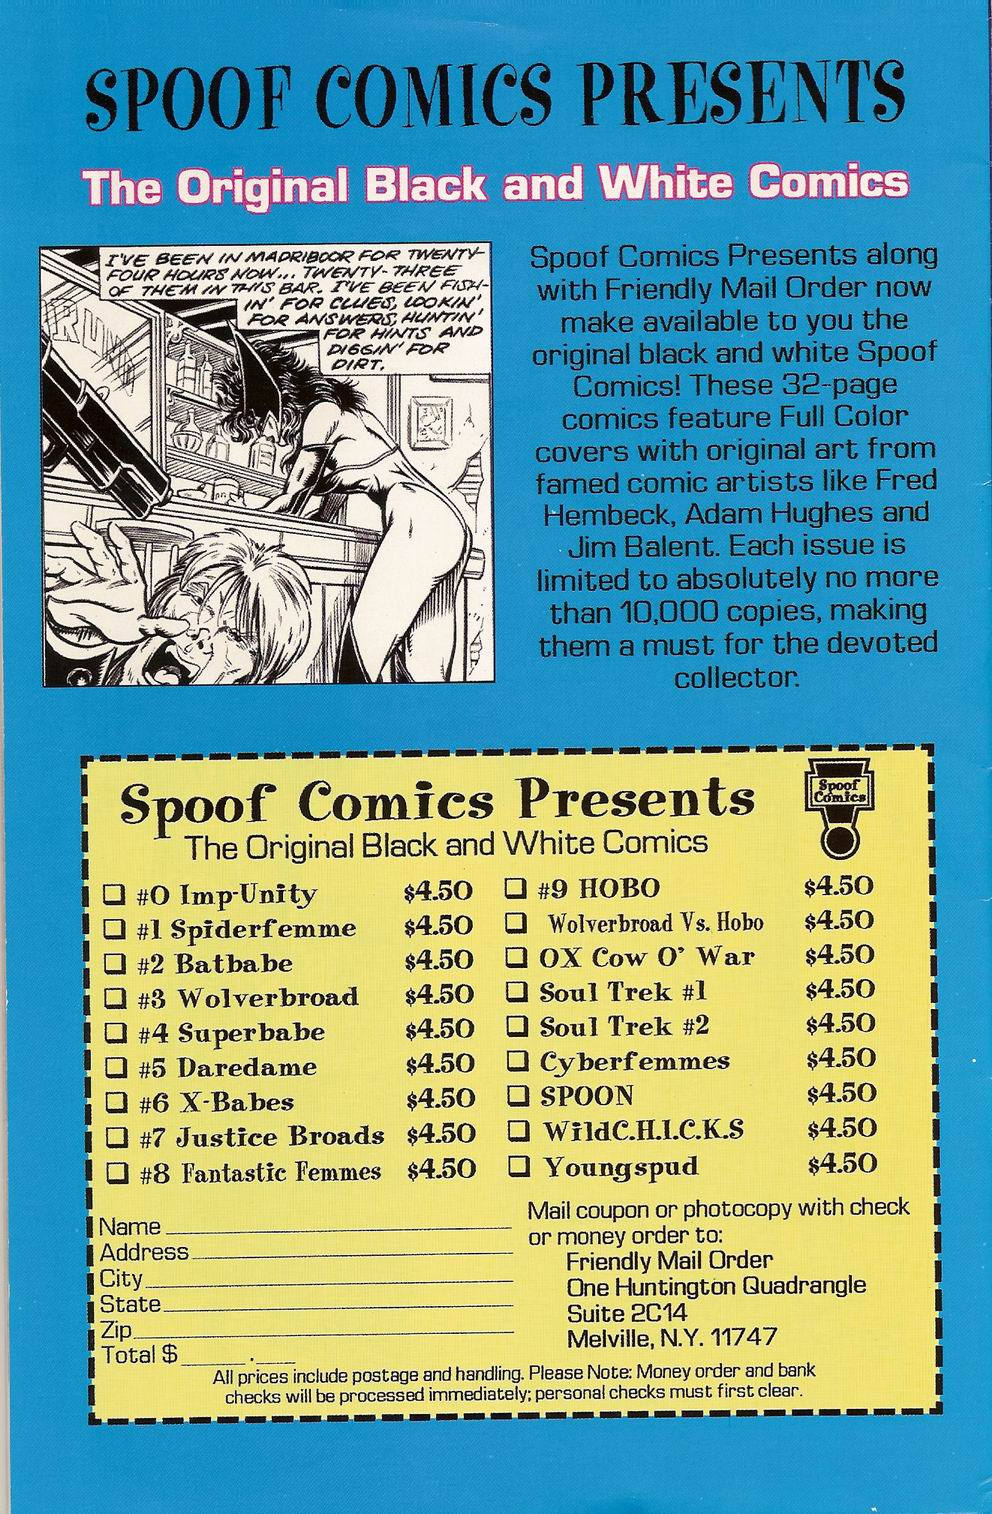 Spoof Comics 12 Page 29